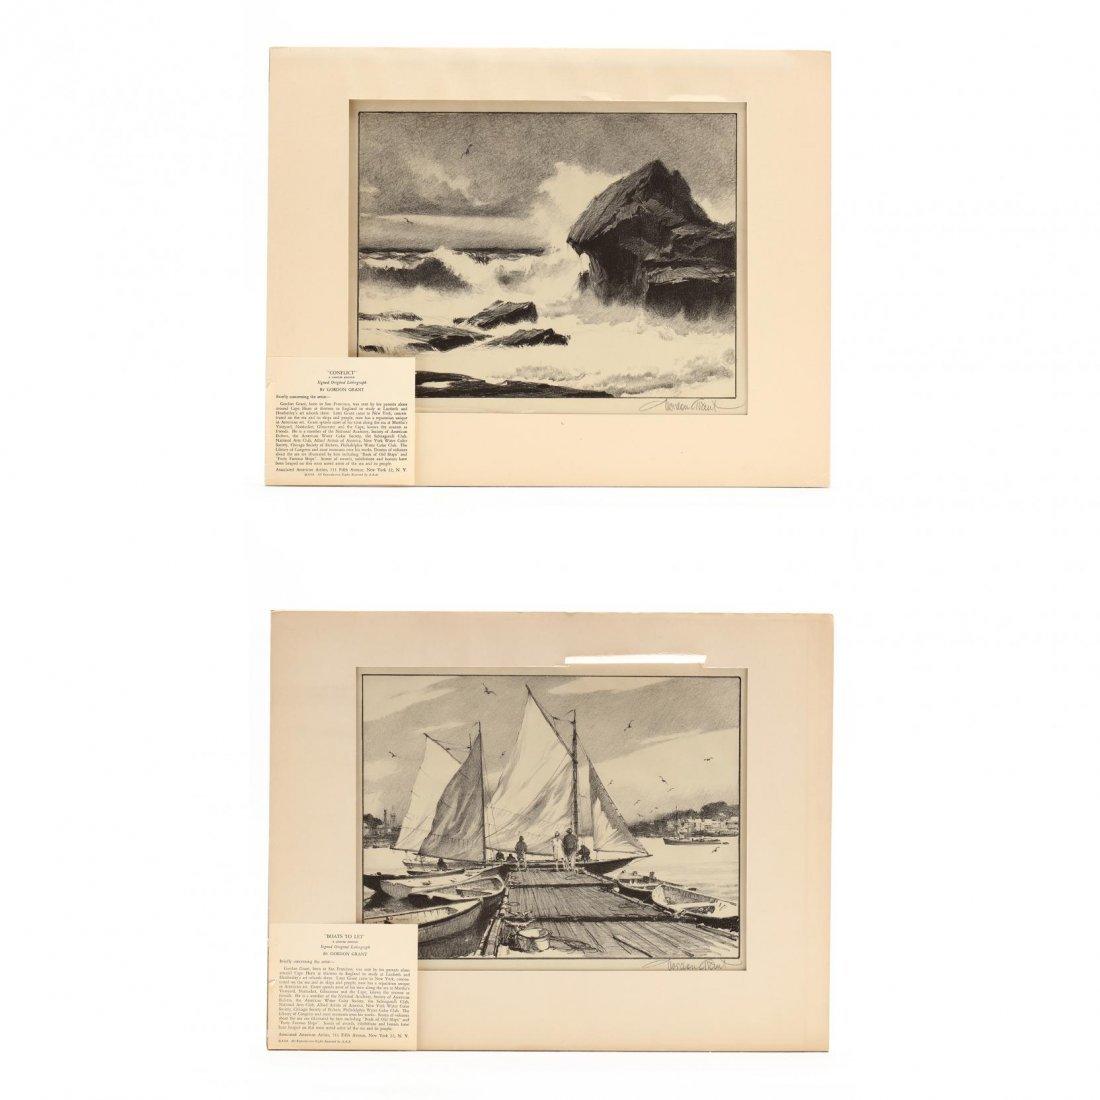 Gordon Grant (American, 1875-1962), Two Water Views